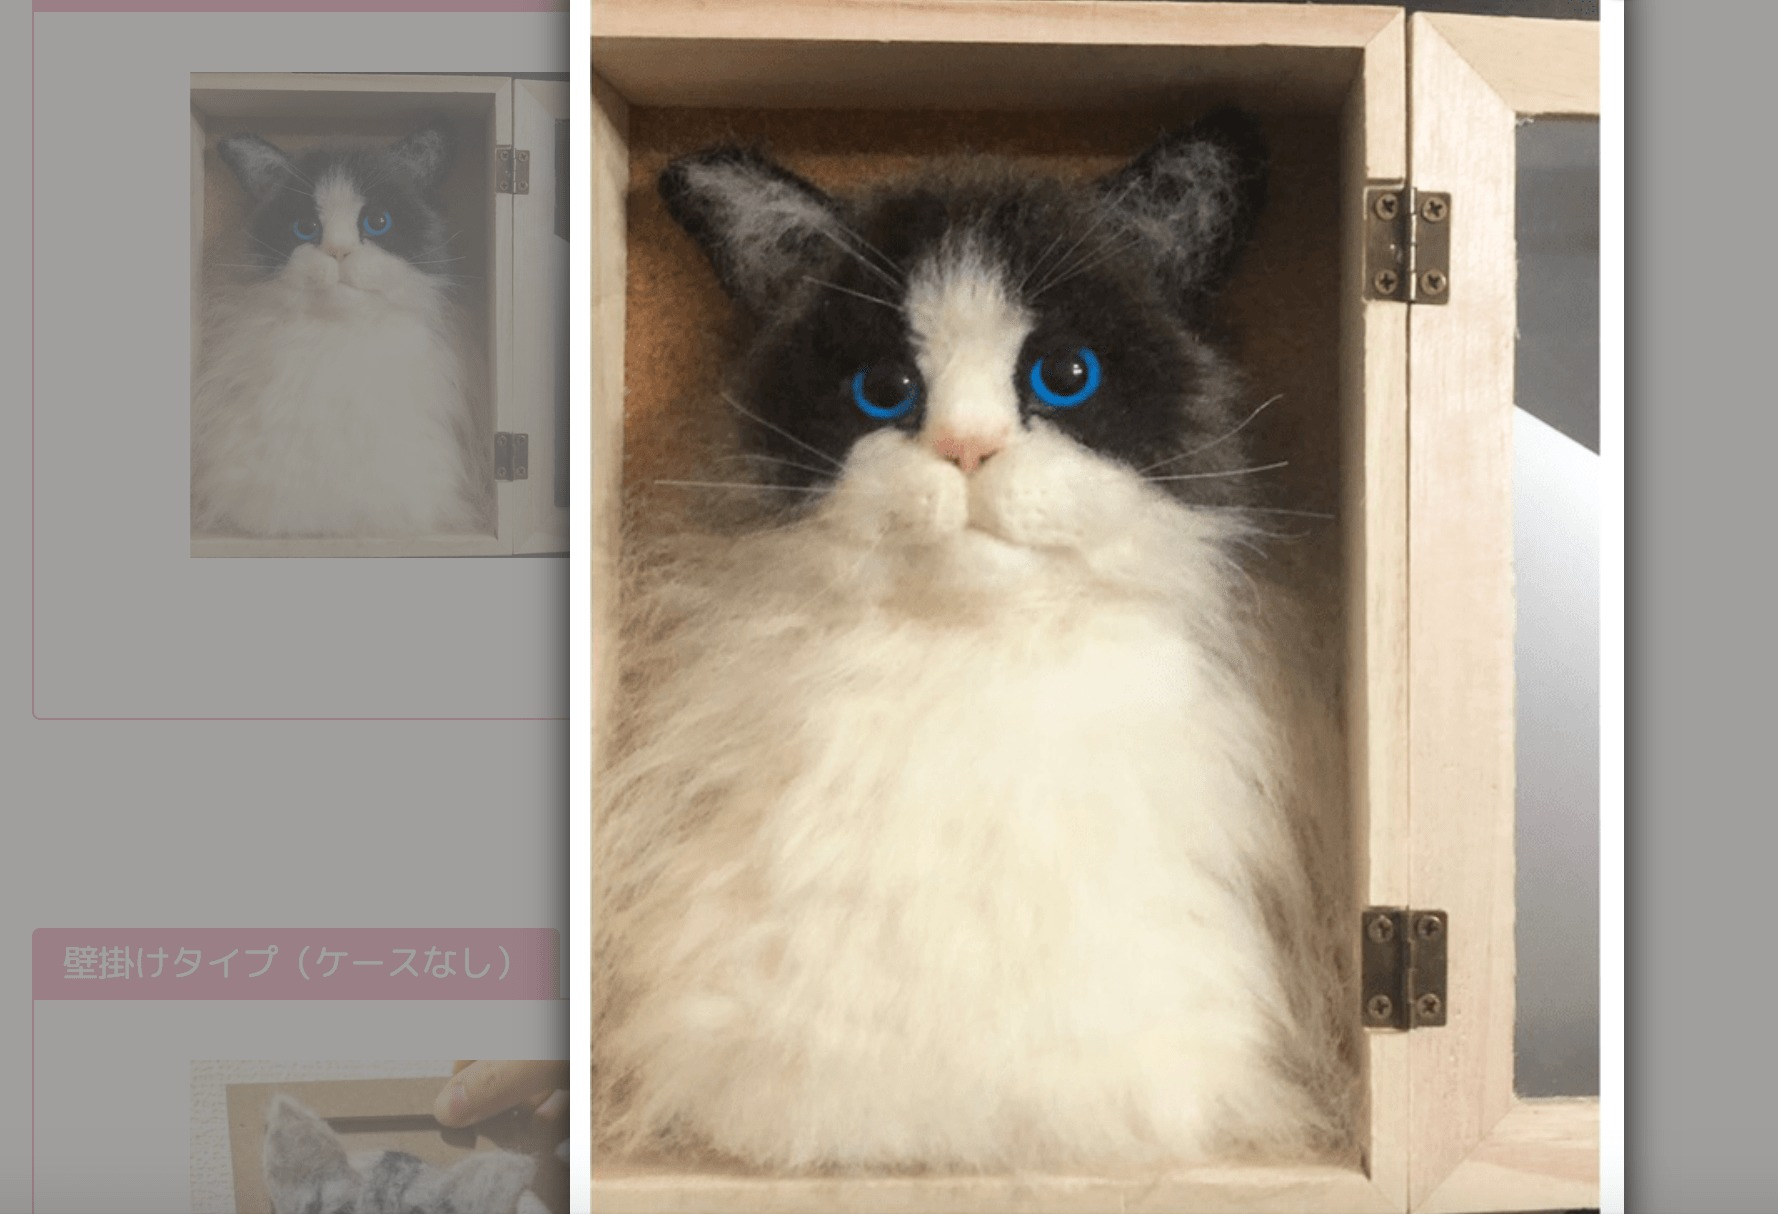 satomiハンドメイド工房 猫